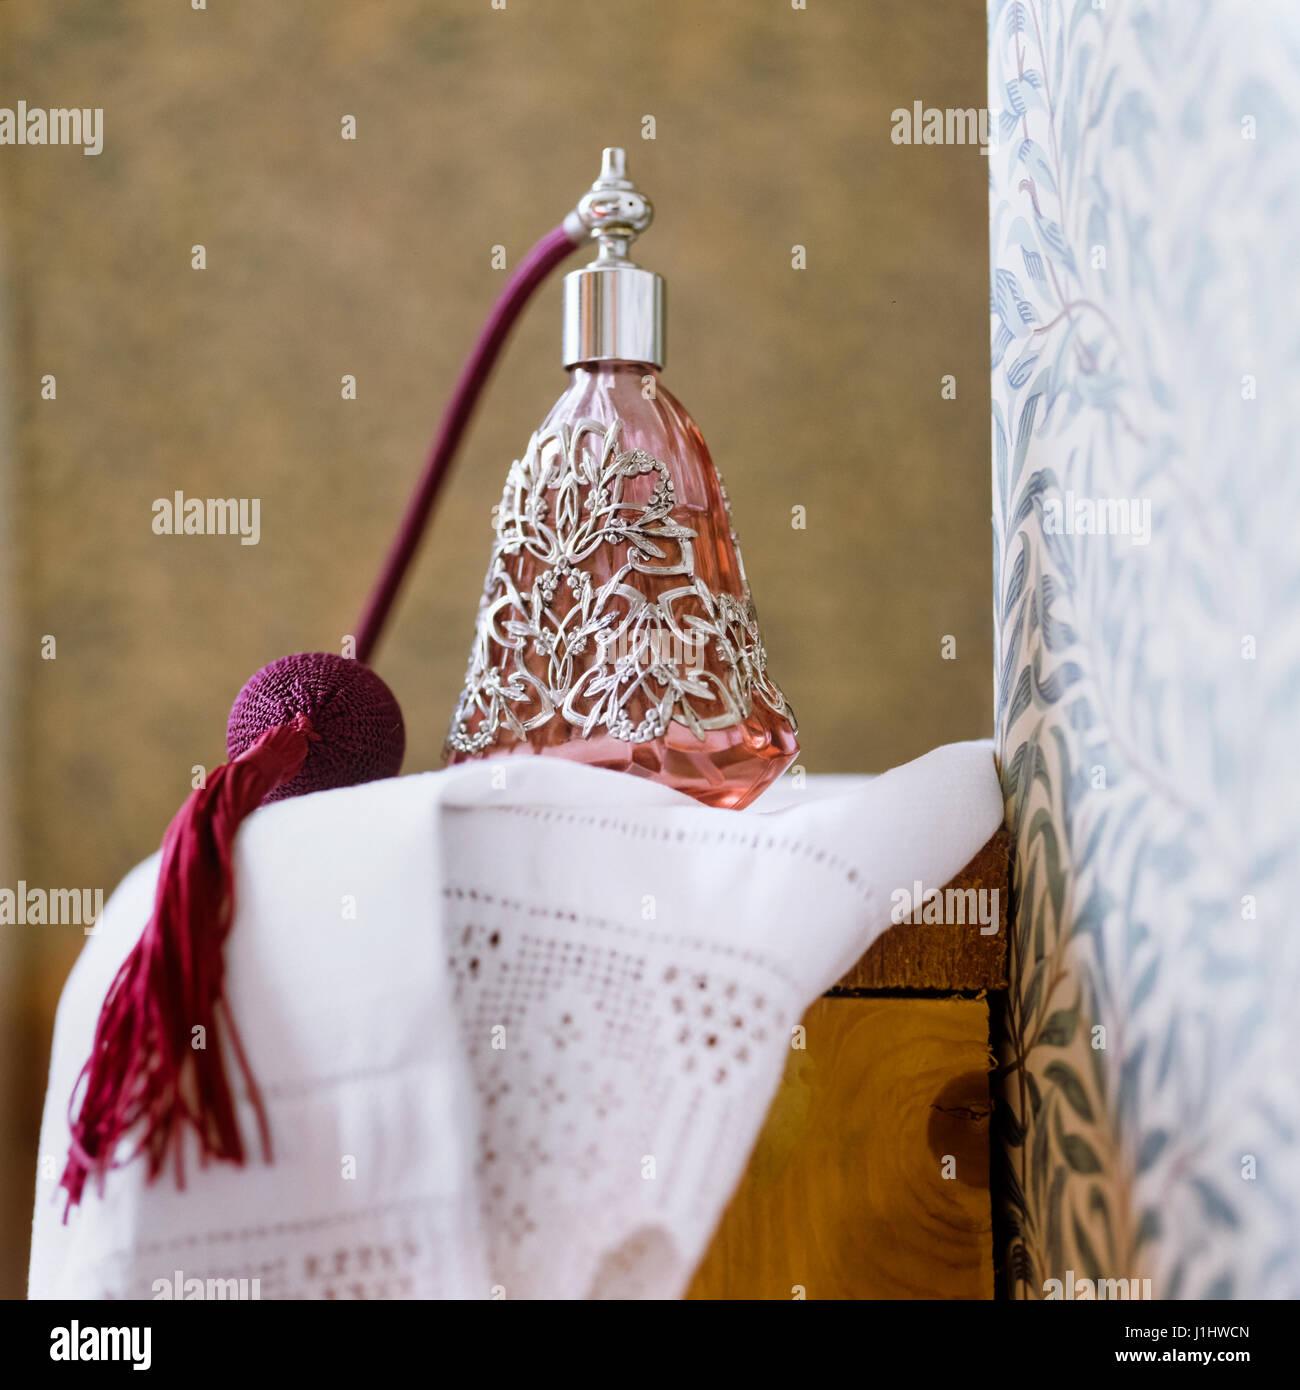 Vintage perfume bottle. - Stock Image